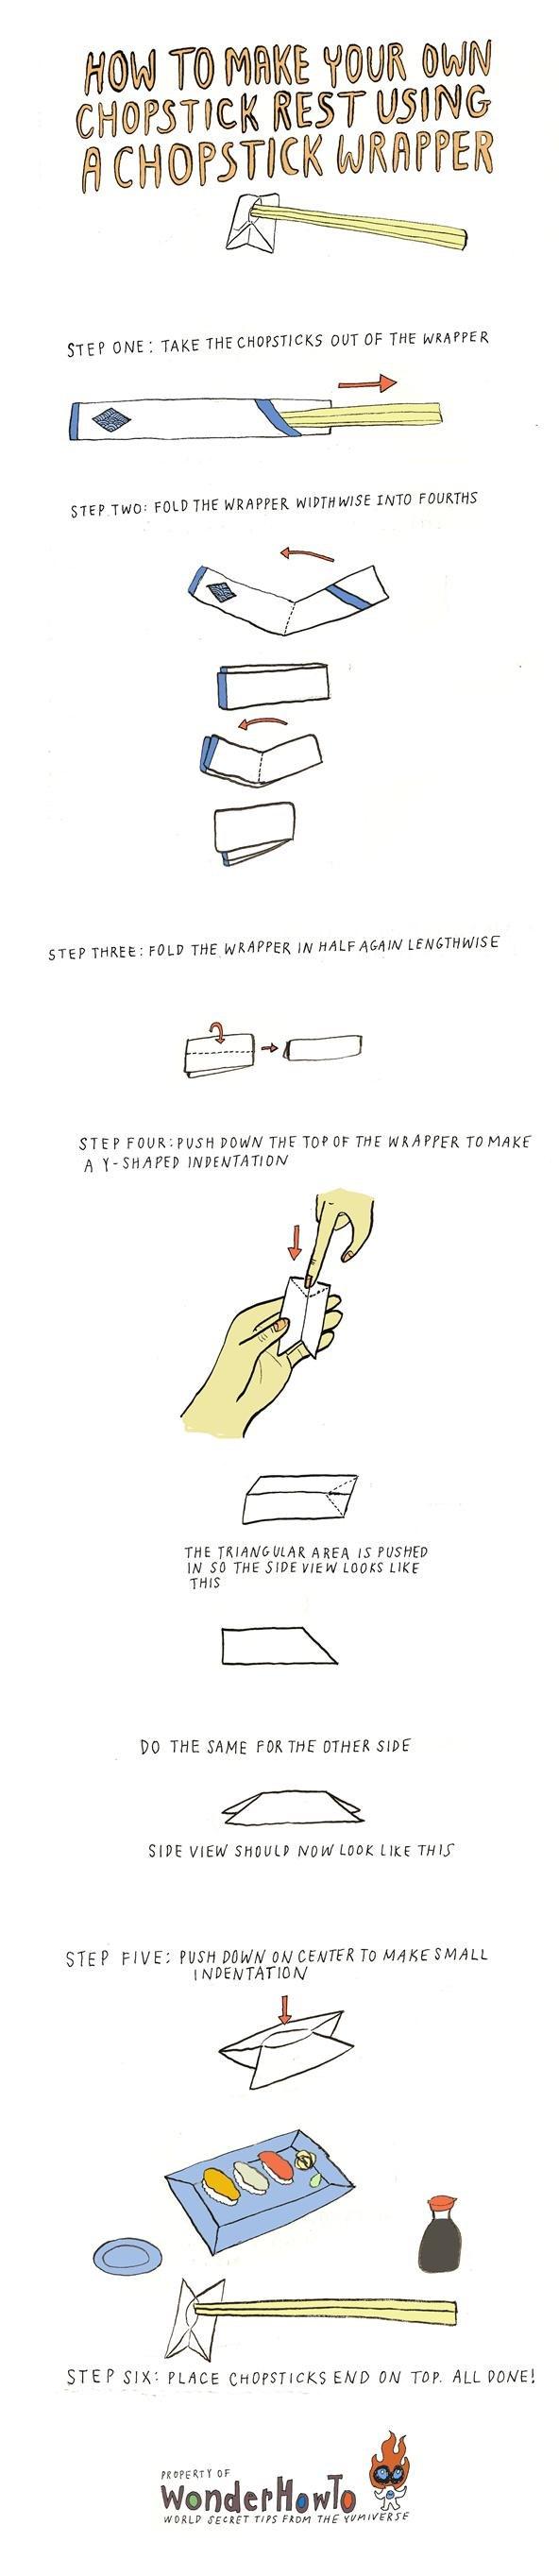 Origami Using Chopstick Wrapper